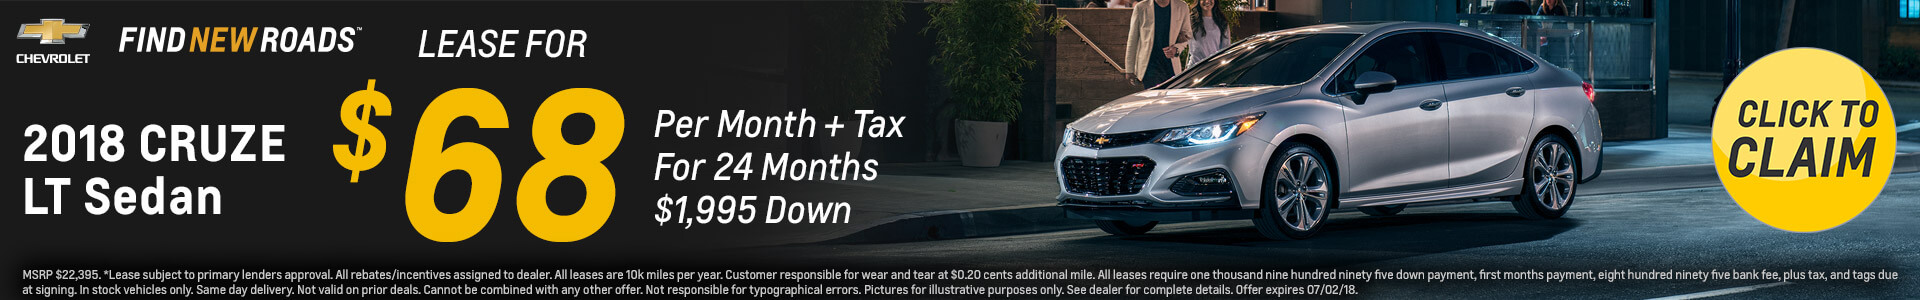 Chevrolet Cruze $68 Lease